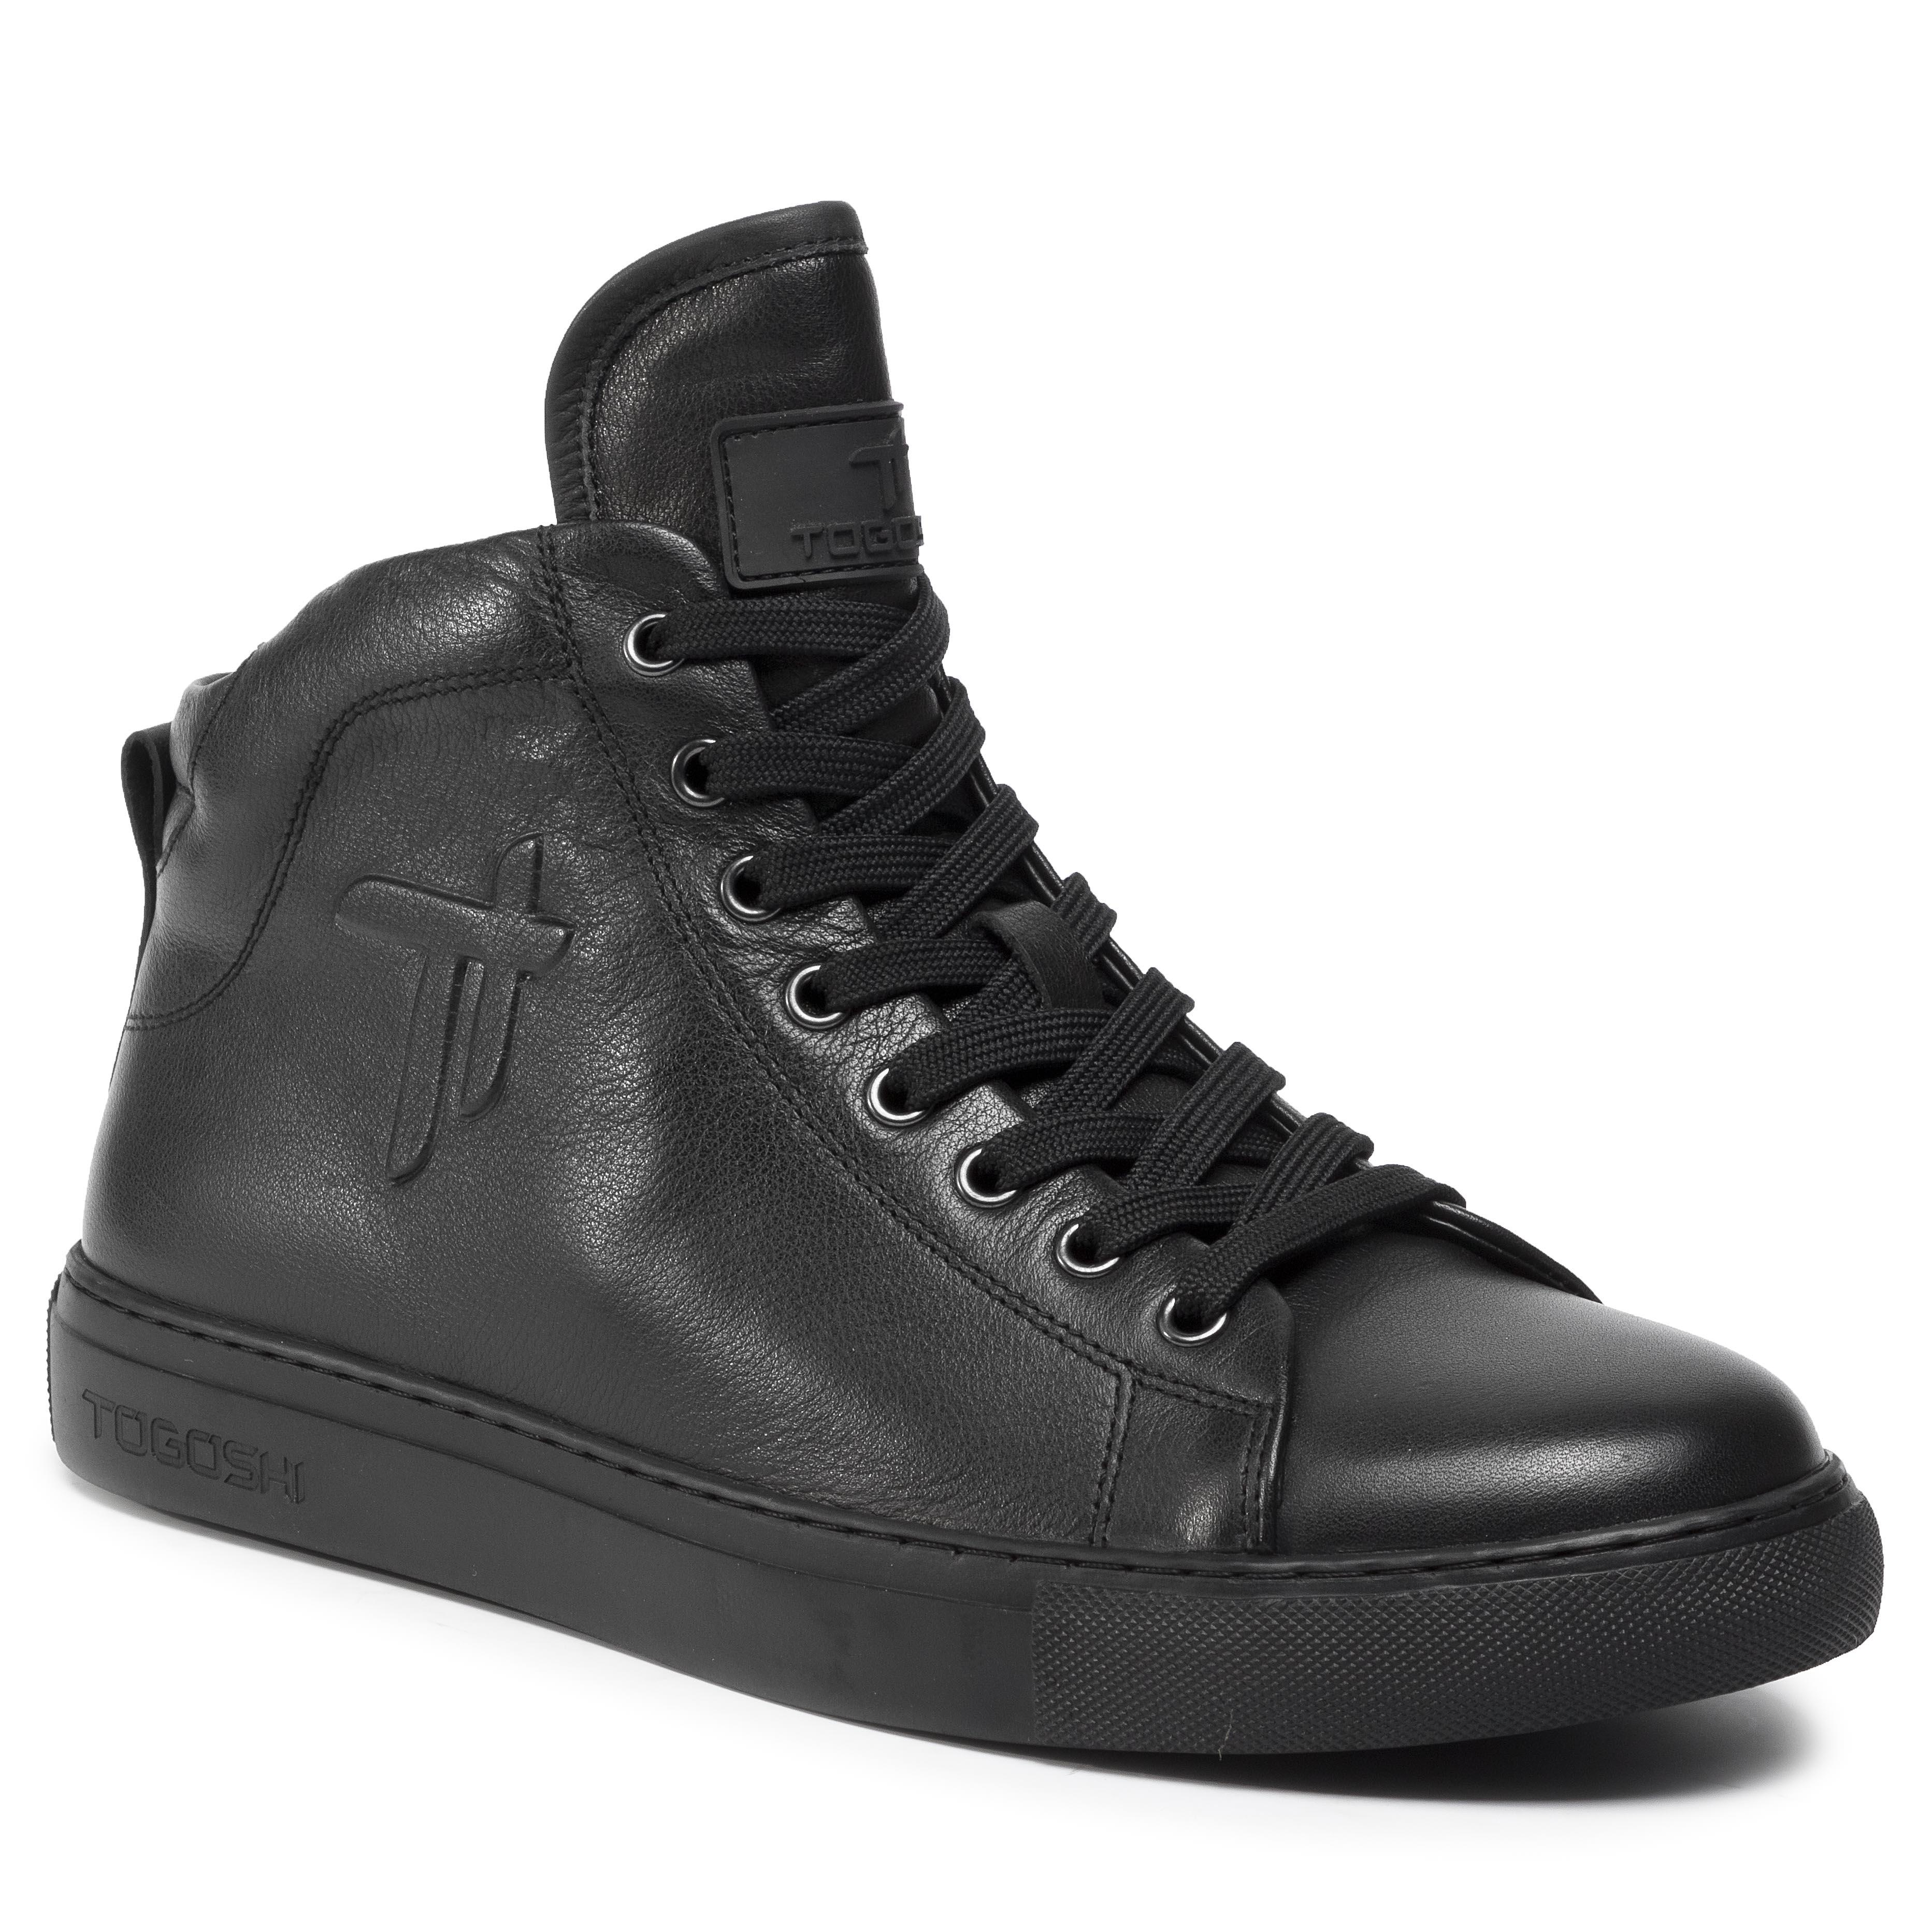 Sportcipő TOGOSHI TG 15 03 000125 101